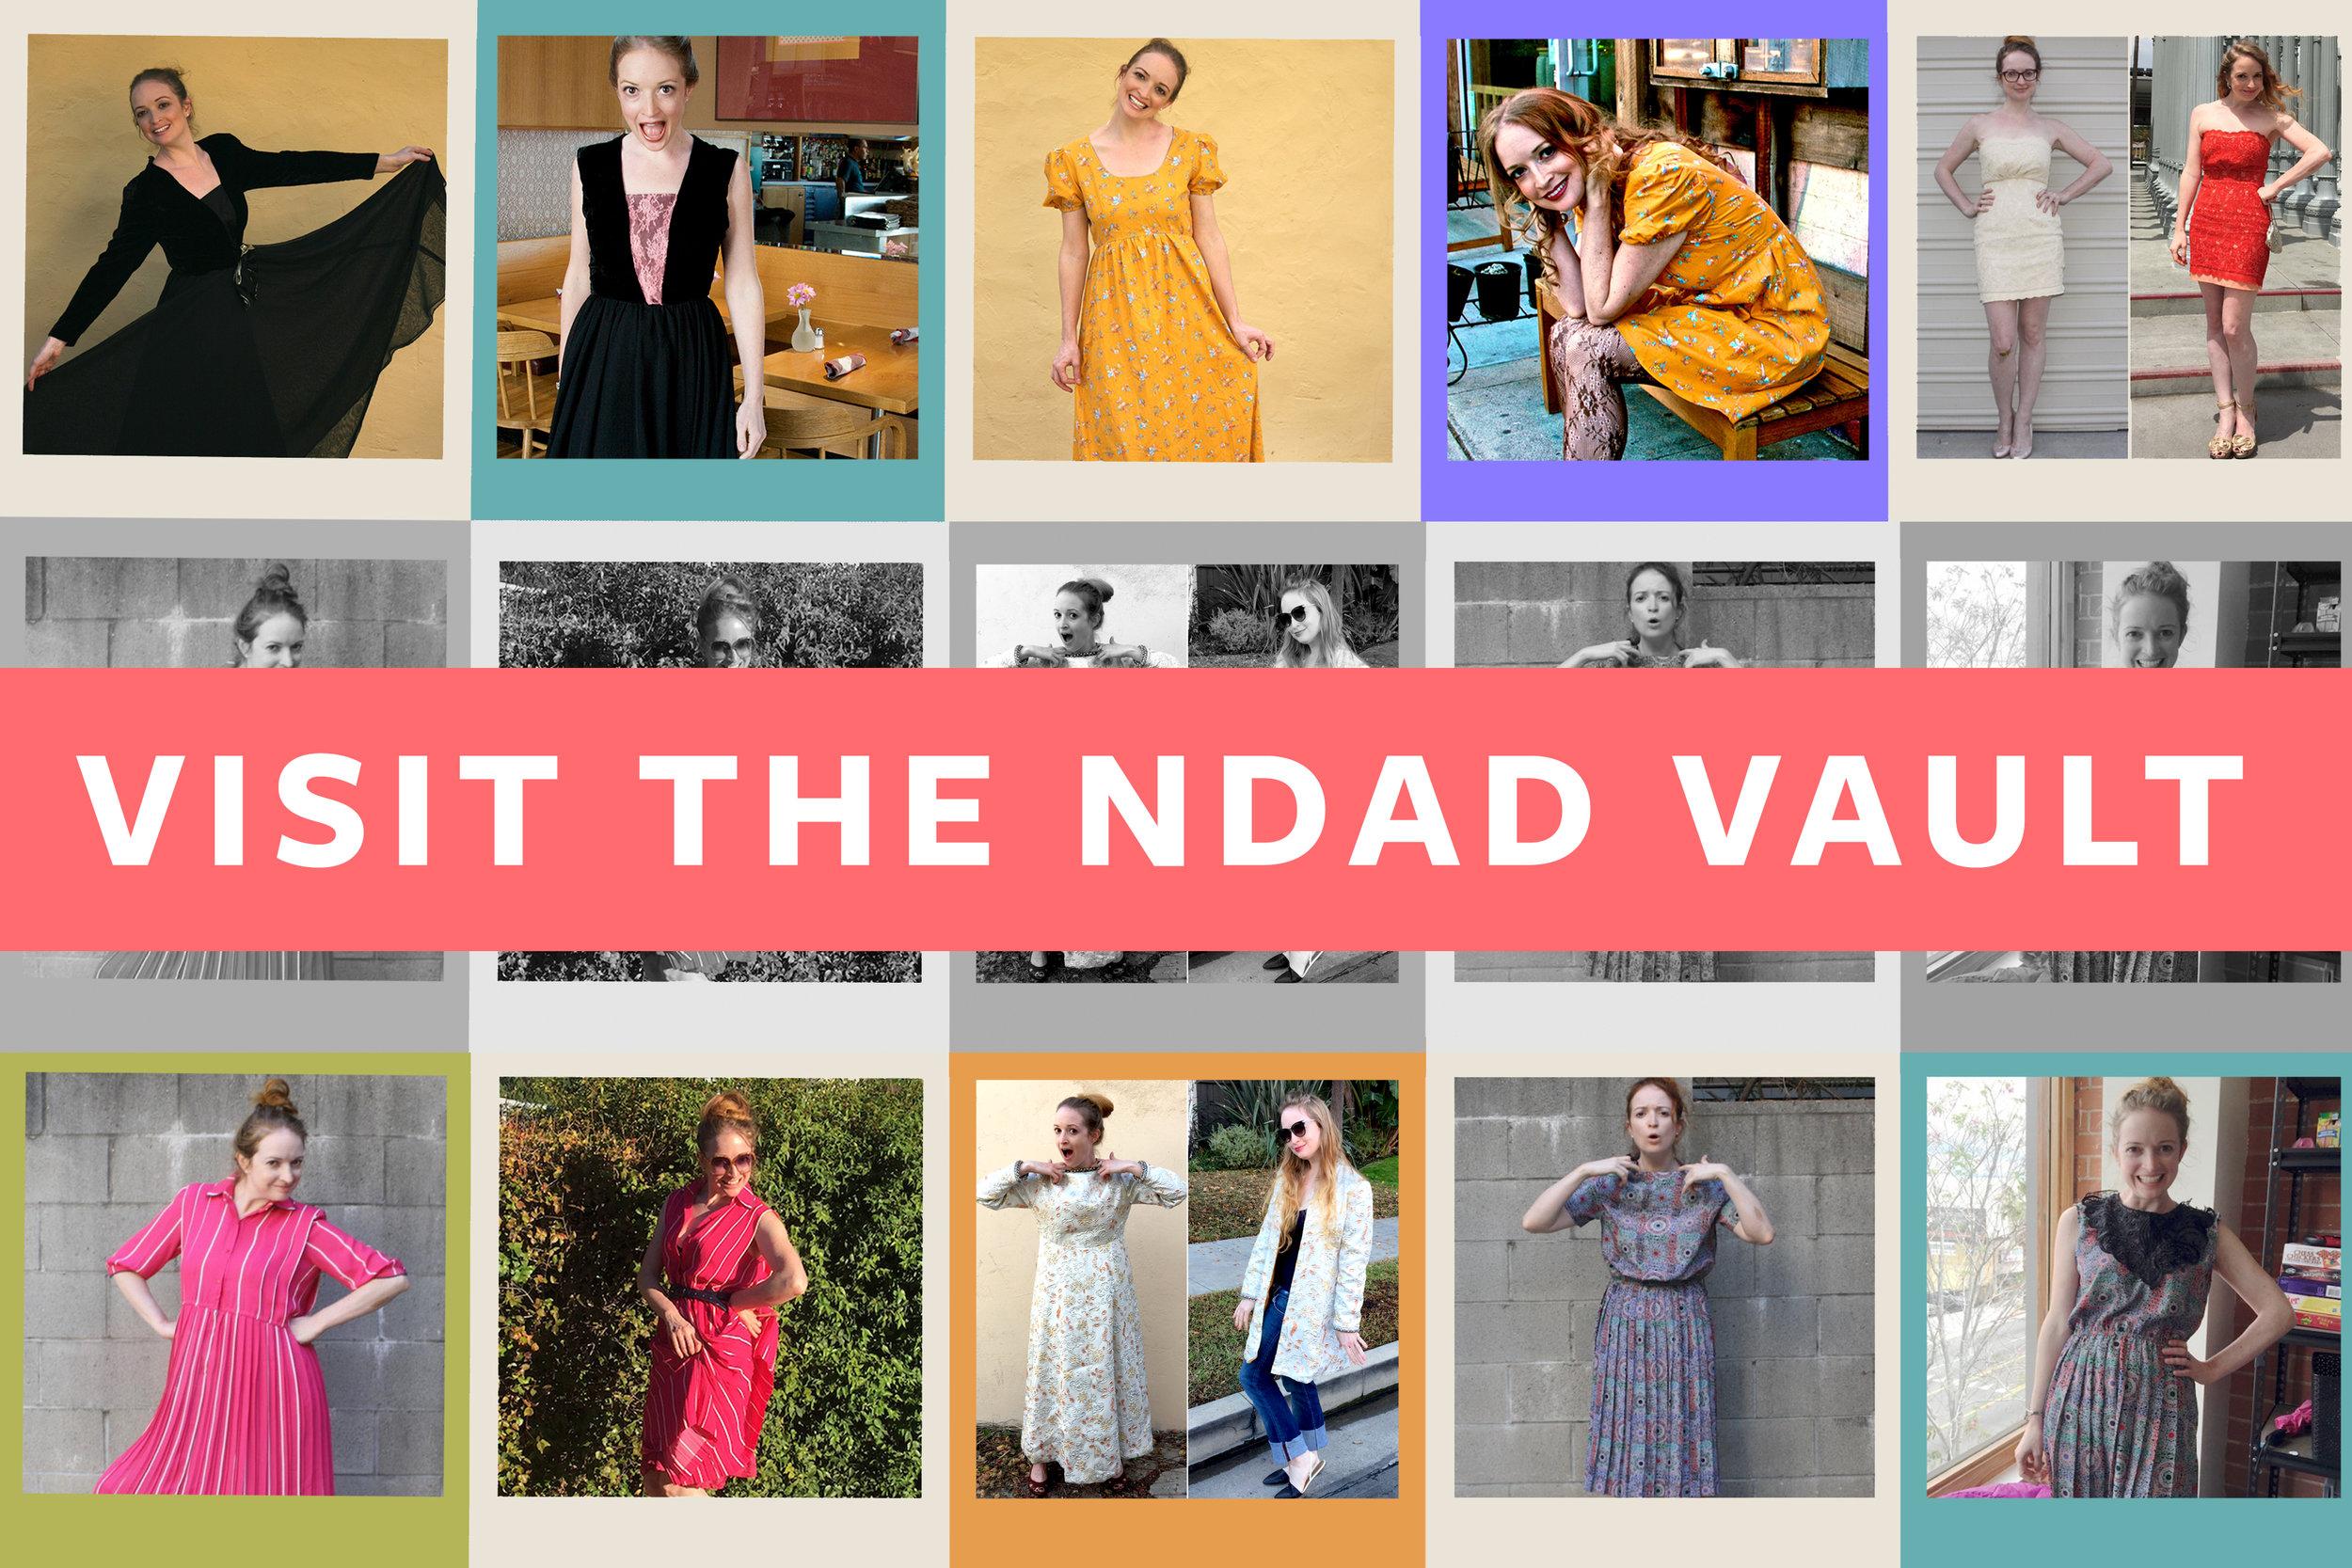 visit-the-NDAD-vault.jpg